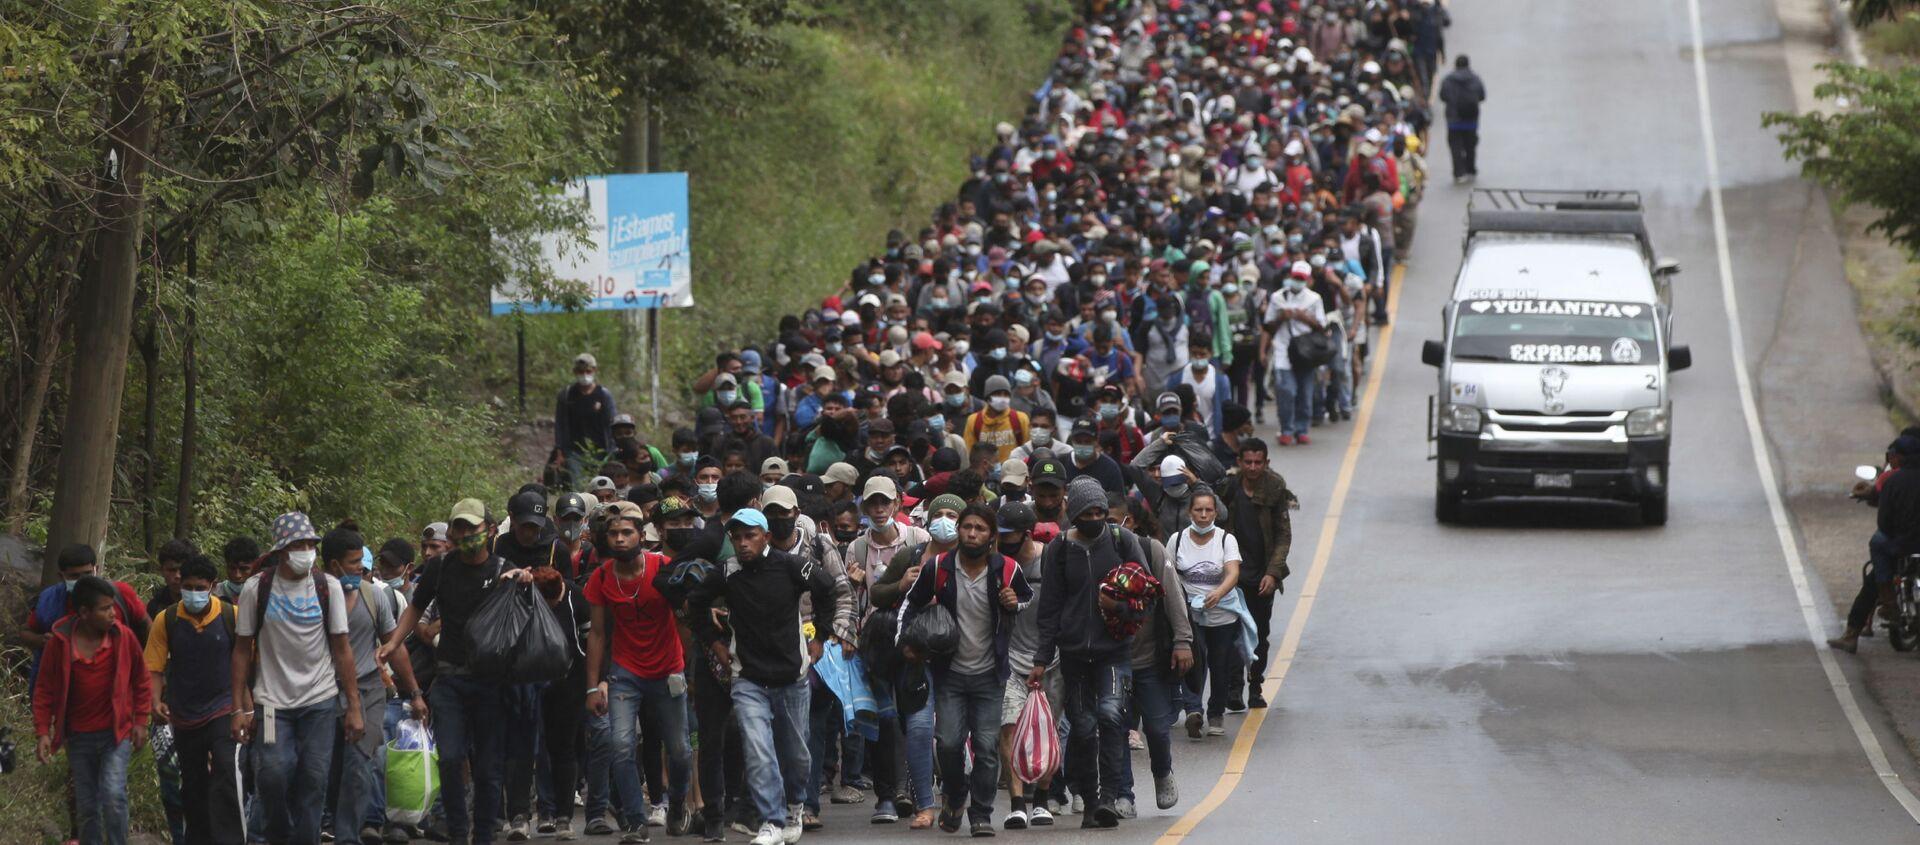 Honduran migrants hoping to reach the U.S. border walk alongside a highway in Chiquimula, Guatemala, Saturday, Jan. 16, 2021 - Sputnik International, 1920, 02.05.2021